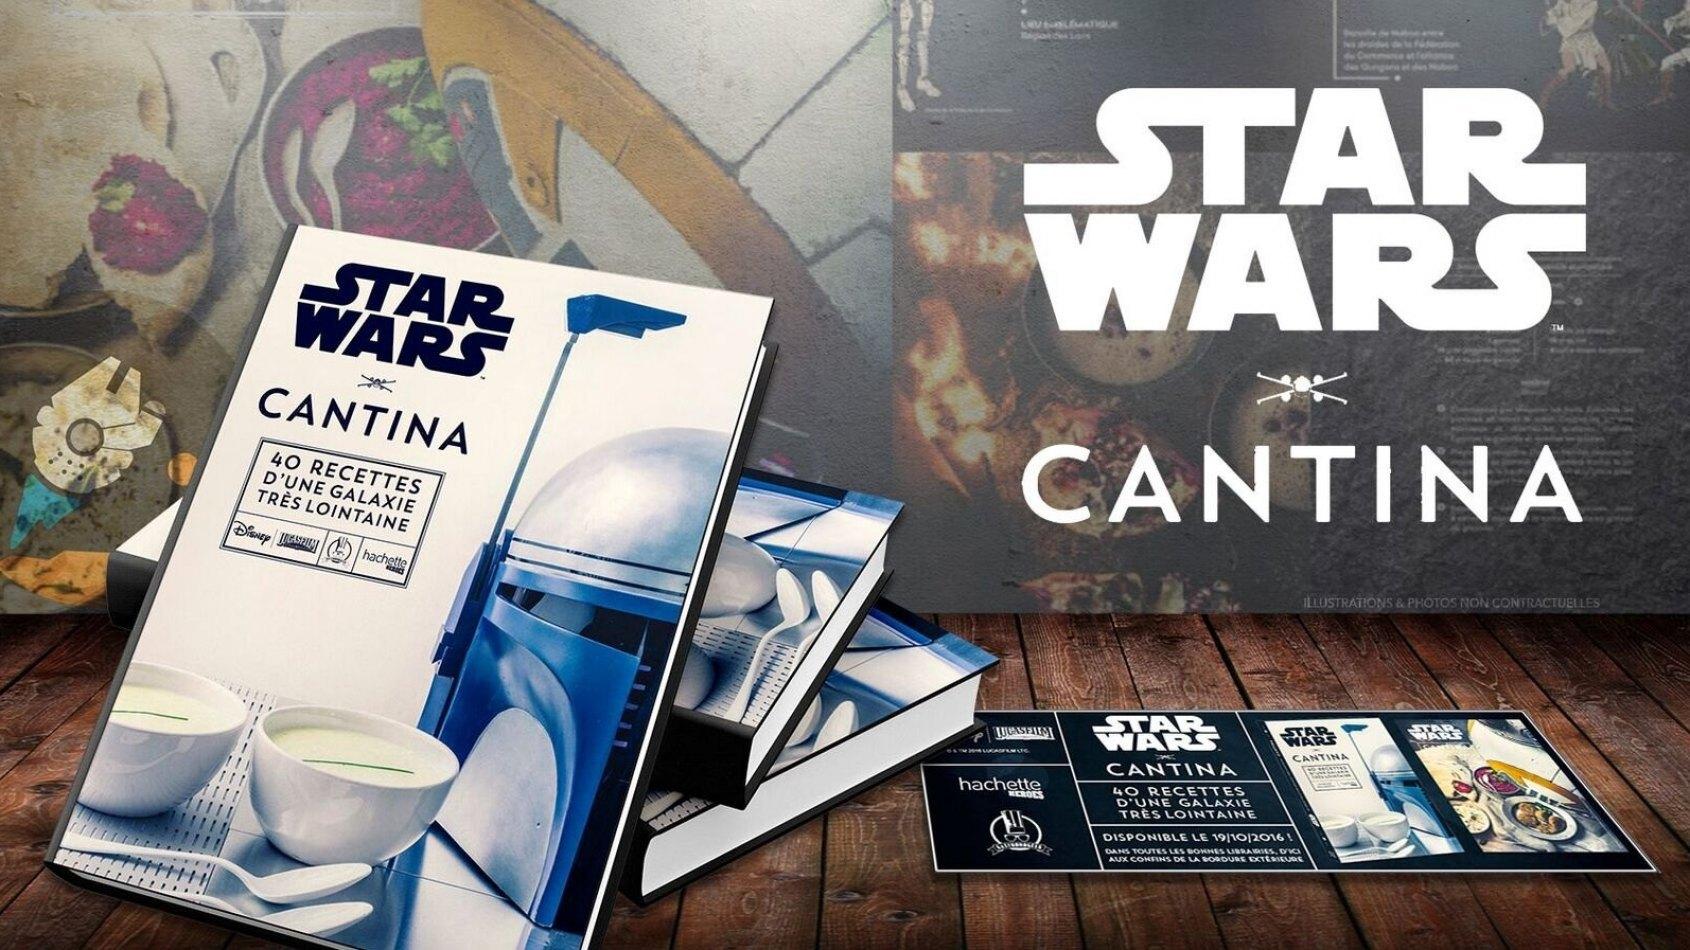 Hachette : Sortie de Star Wars Cantina, avec Plan�te Star Wars